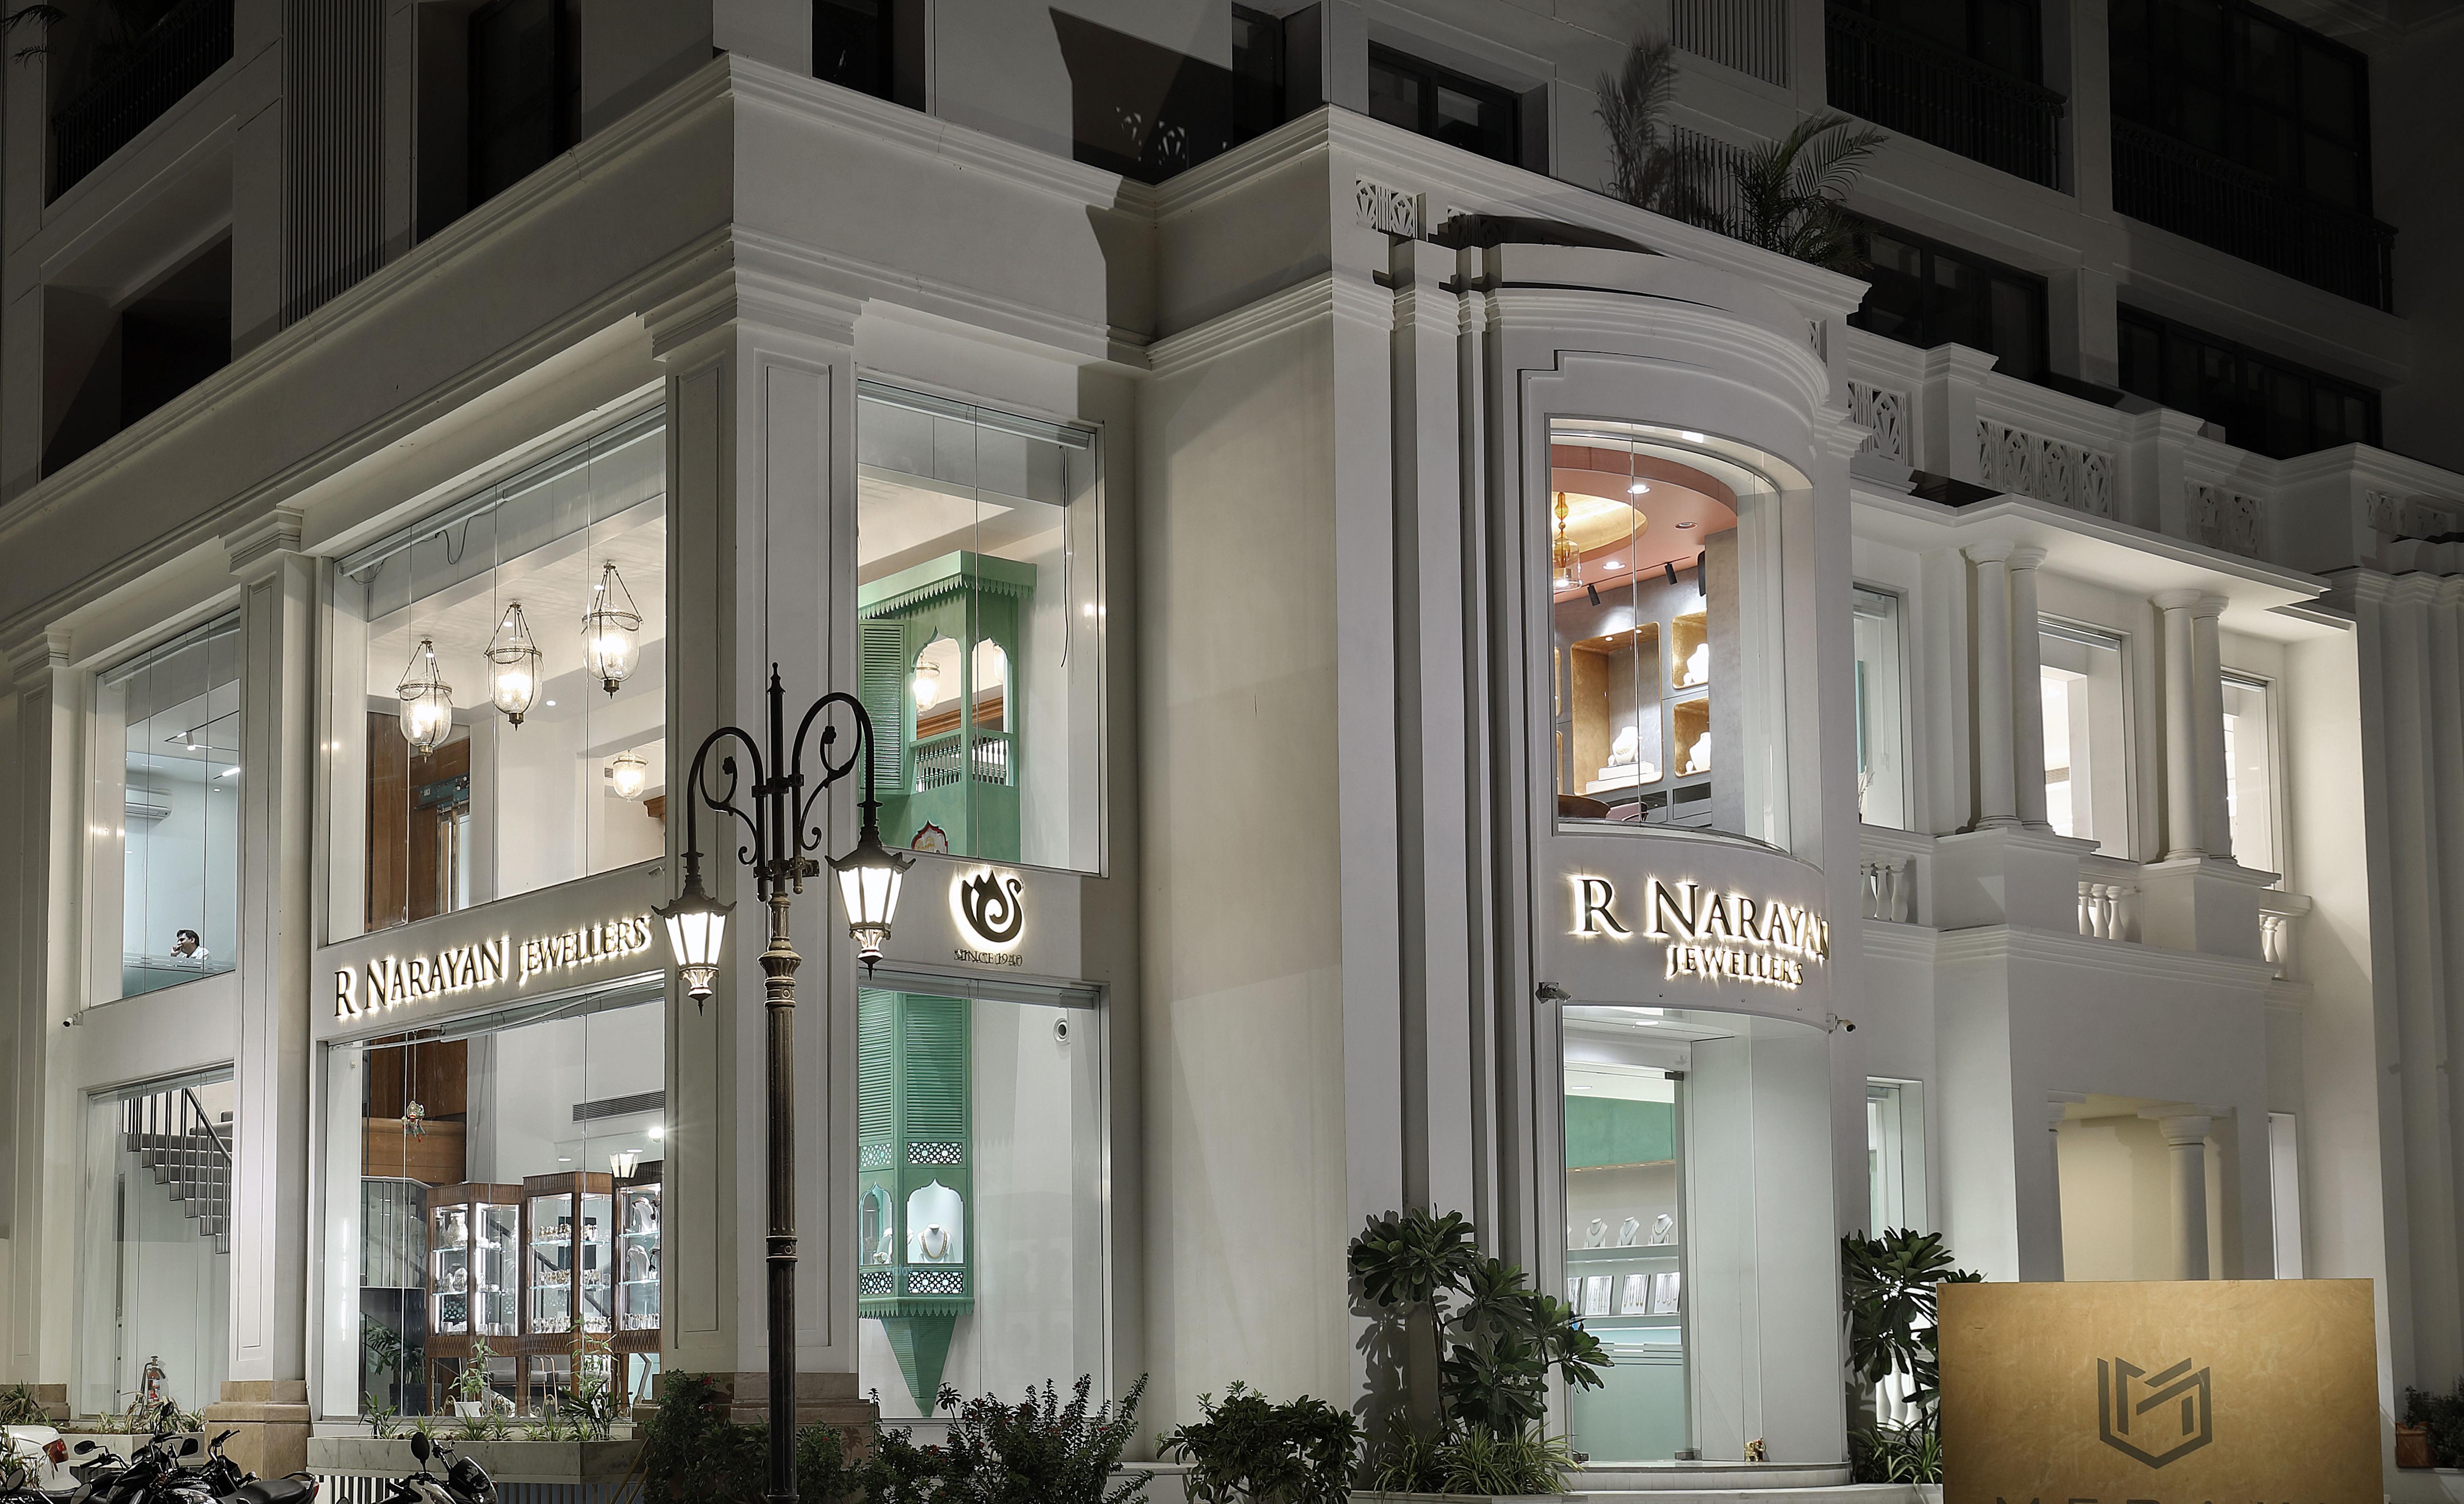 R Narayan Jewellers Store-2